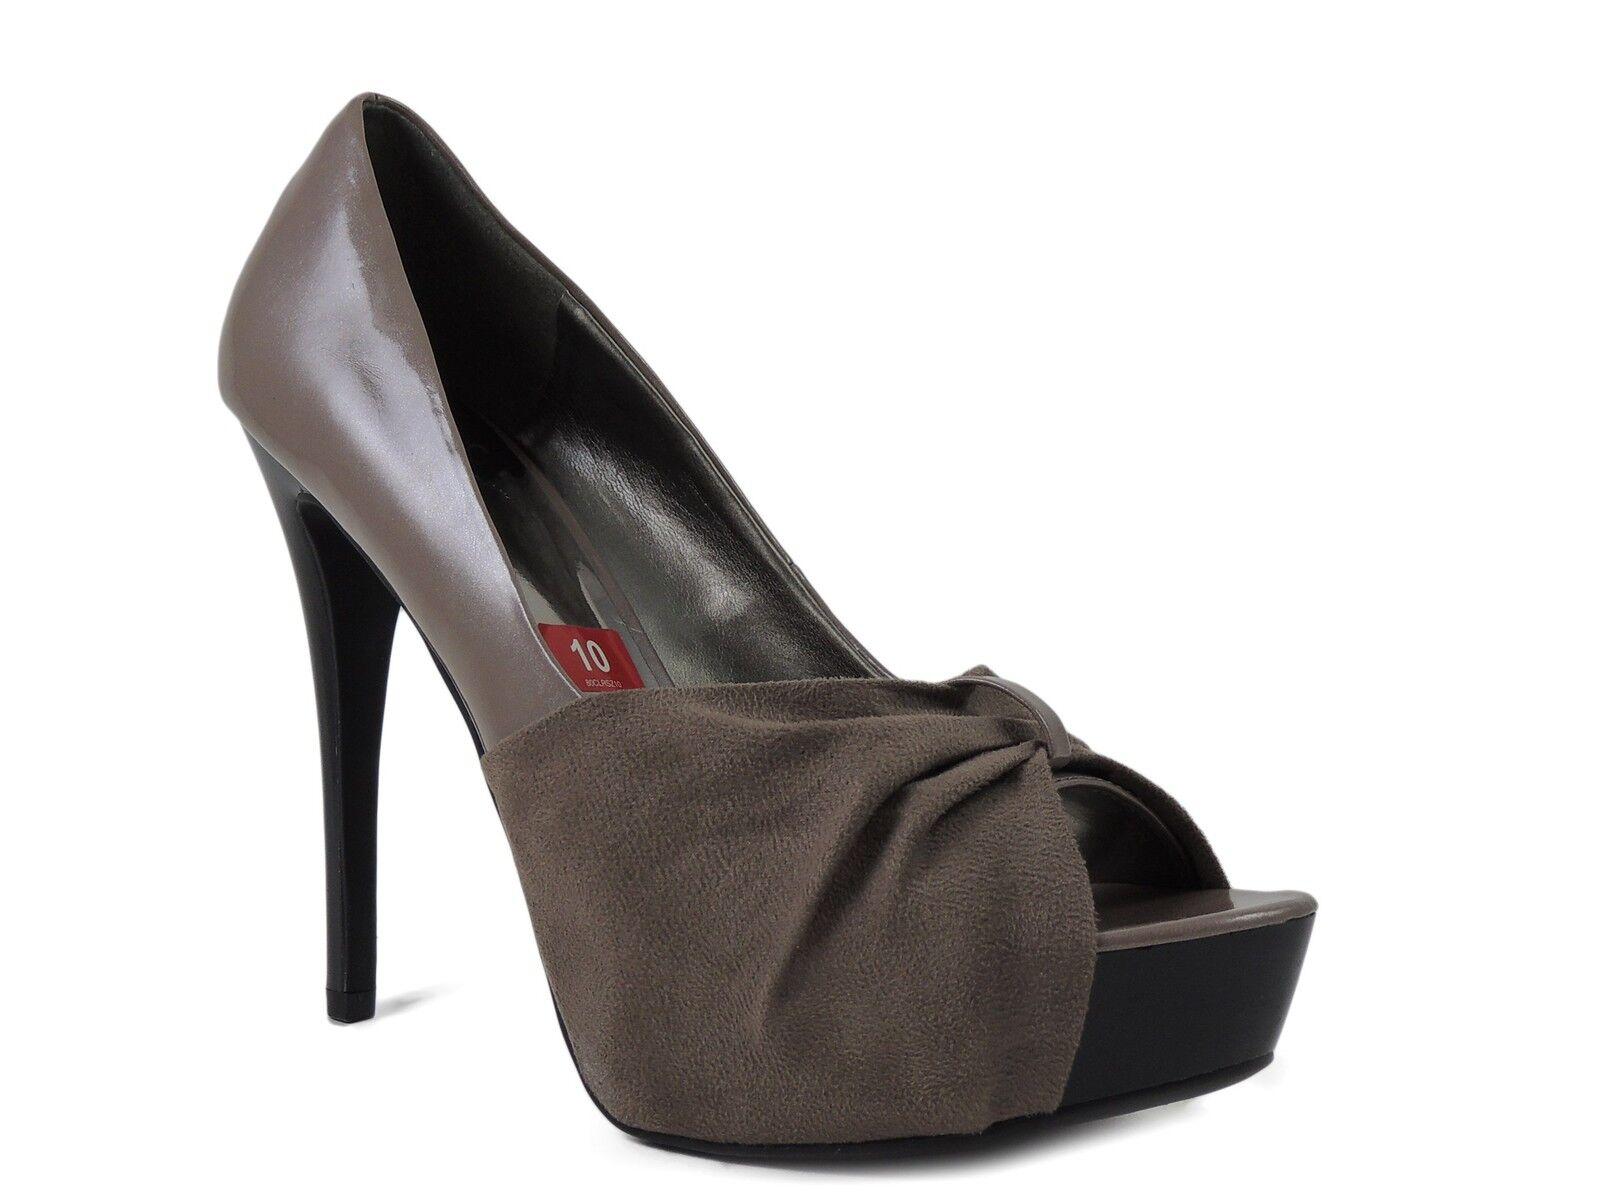 Carlos Santana Women's Damon Peep-Toe Leather Pumps Taupe Size 10